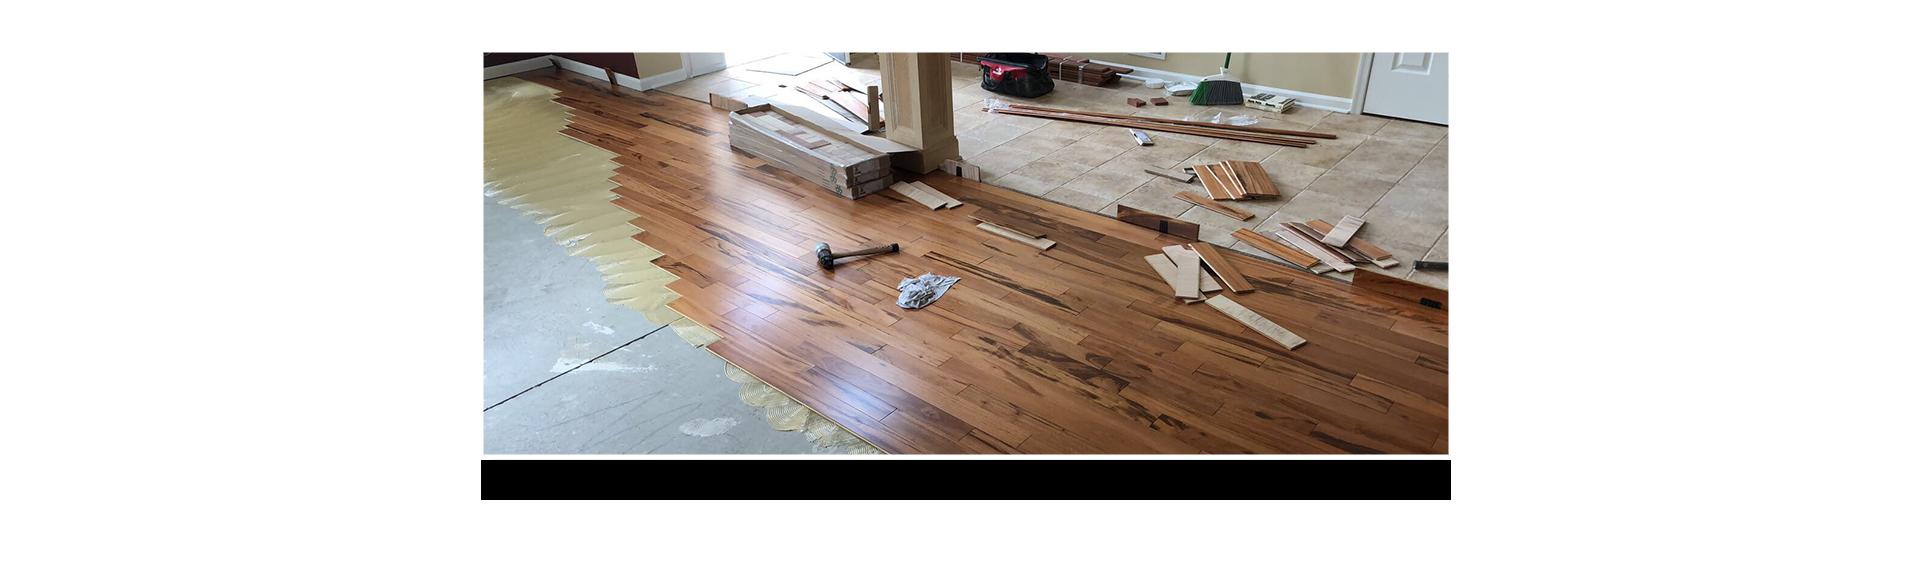 West Windsor Nj Hardwood Floor Installation Amp Refinishing